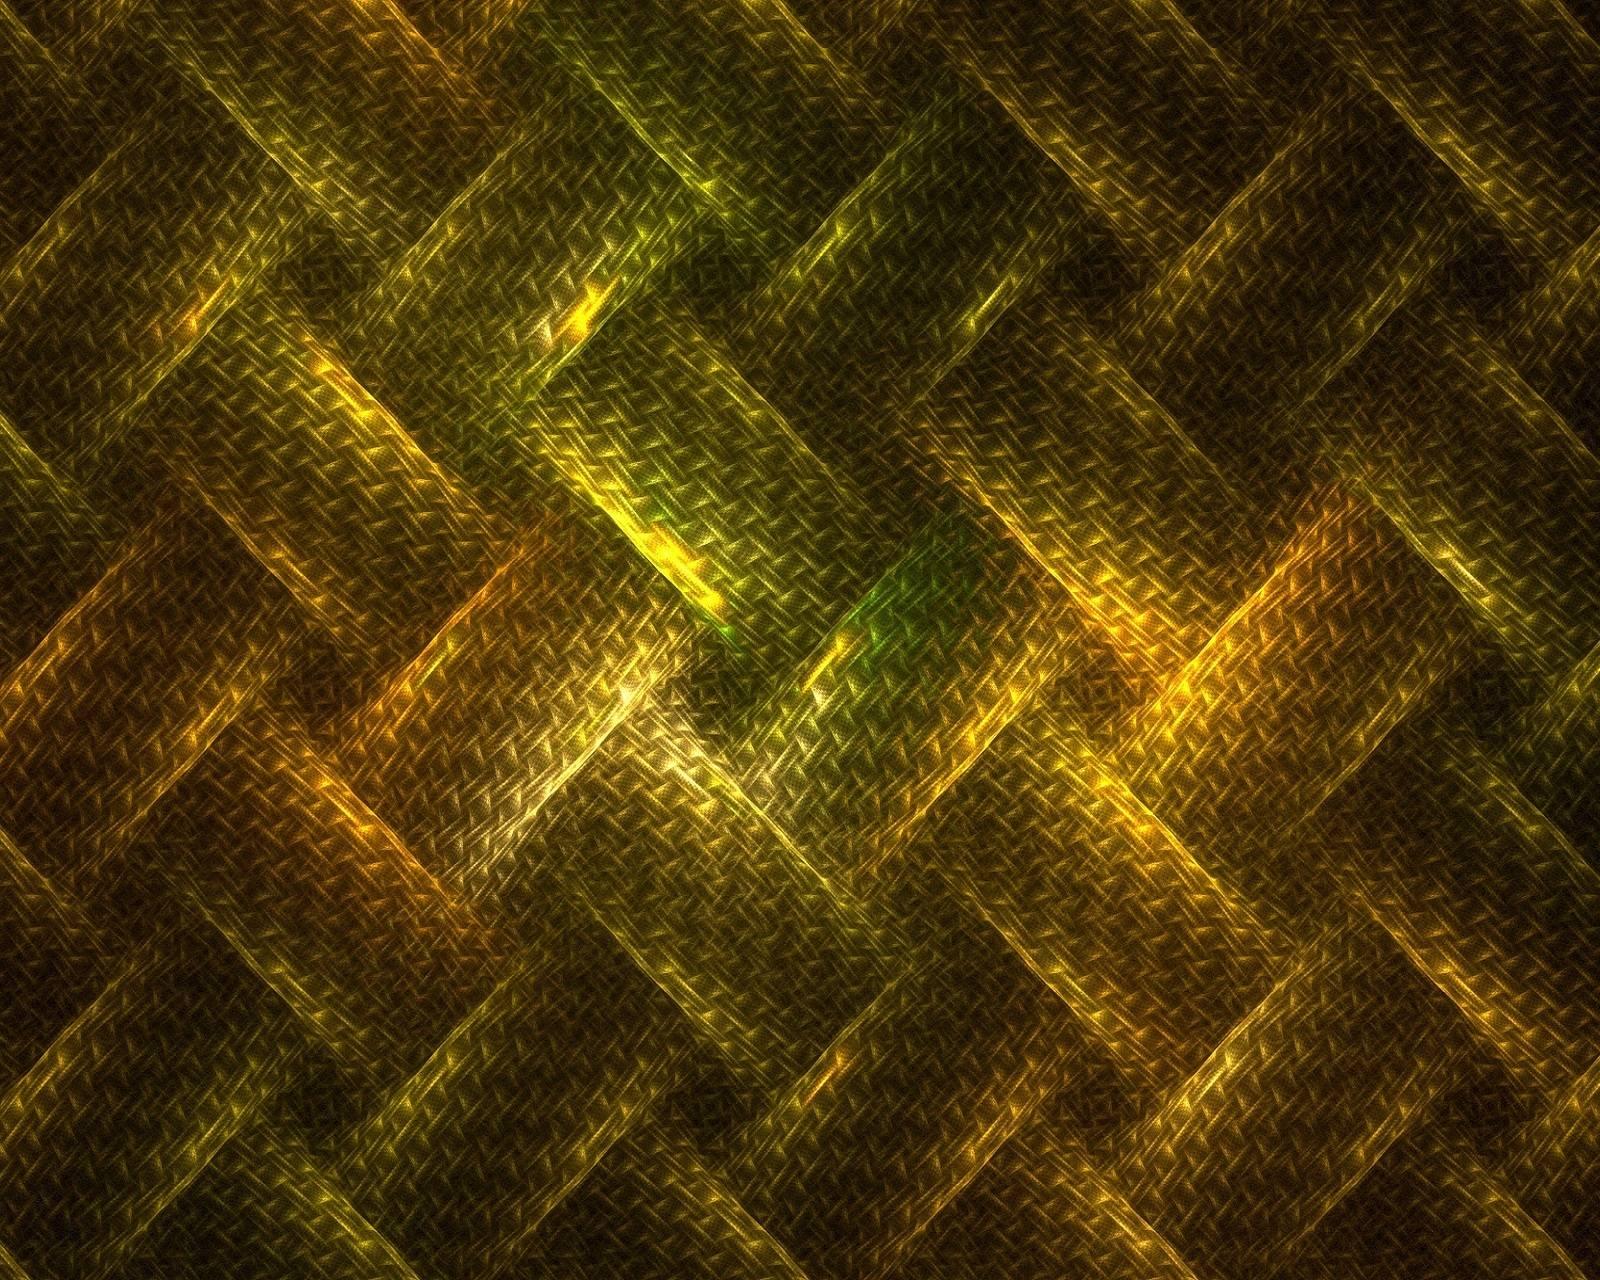 Glow Texture